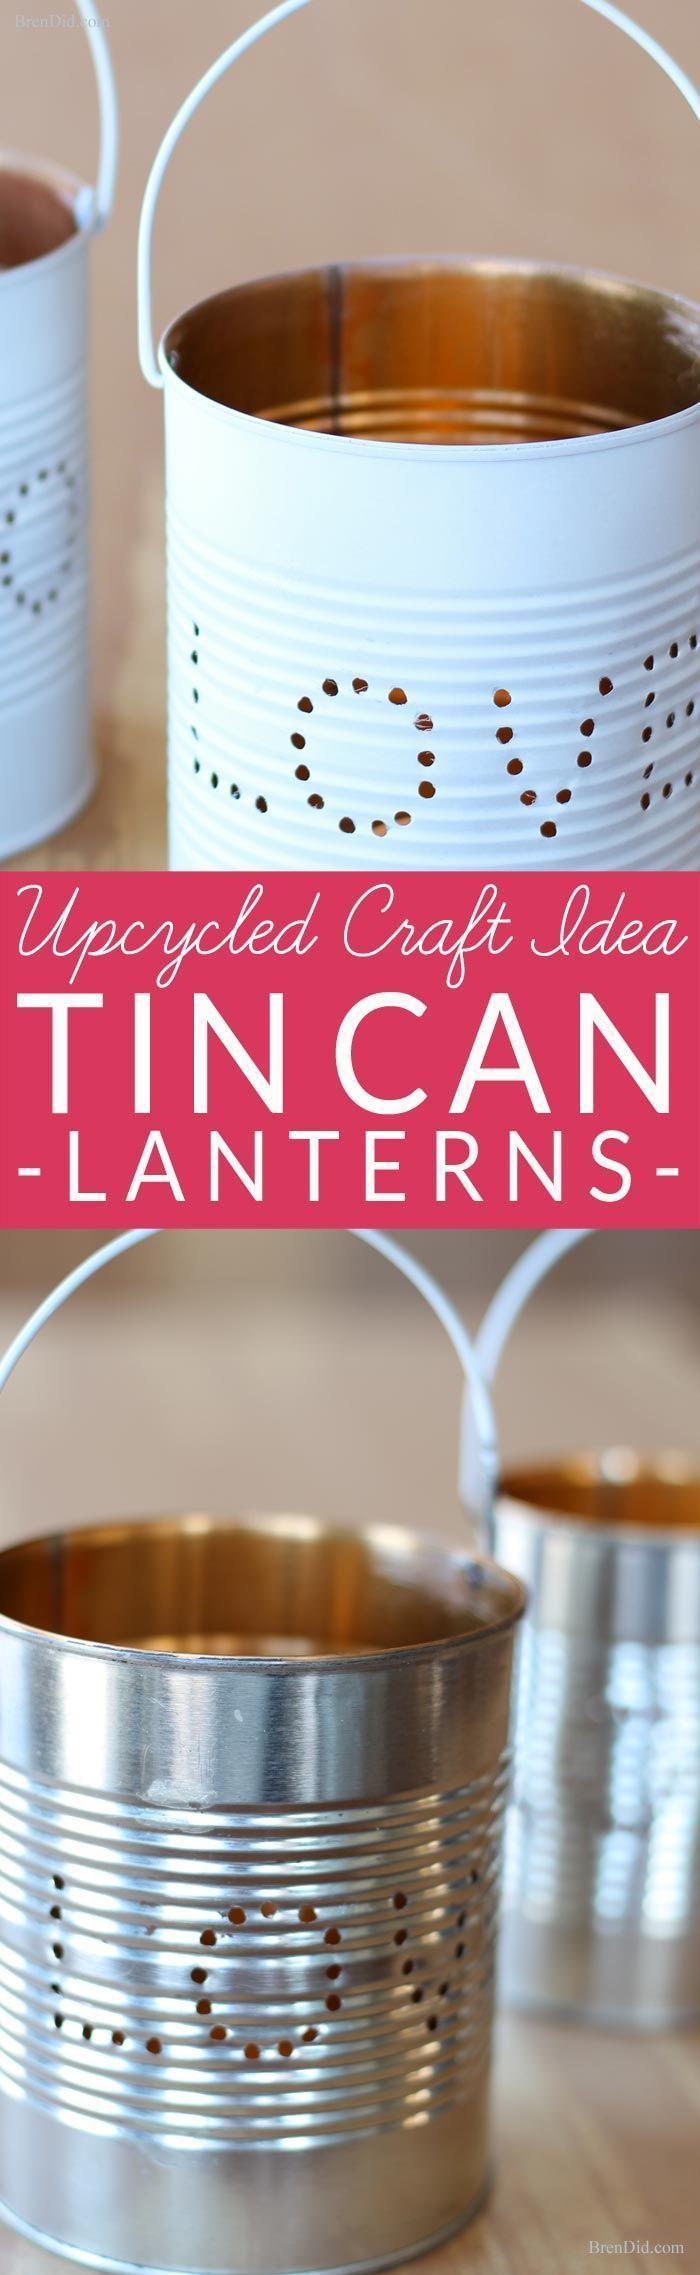 Creative DIY Rustic Wedding Ideas Using Tin Cans Creative DIY Rustic Wedding Ideas Using Tin Cans new foto